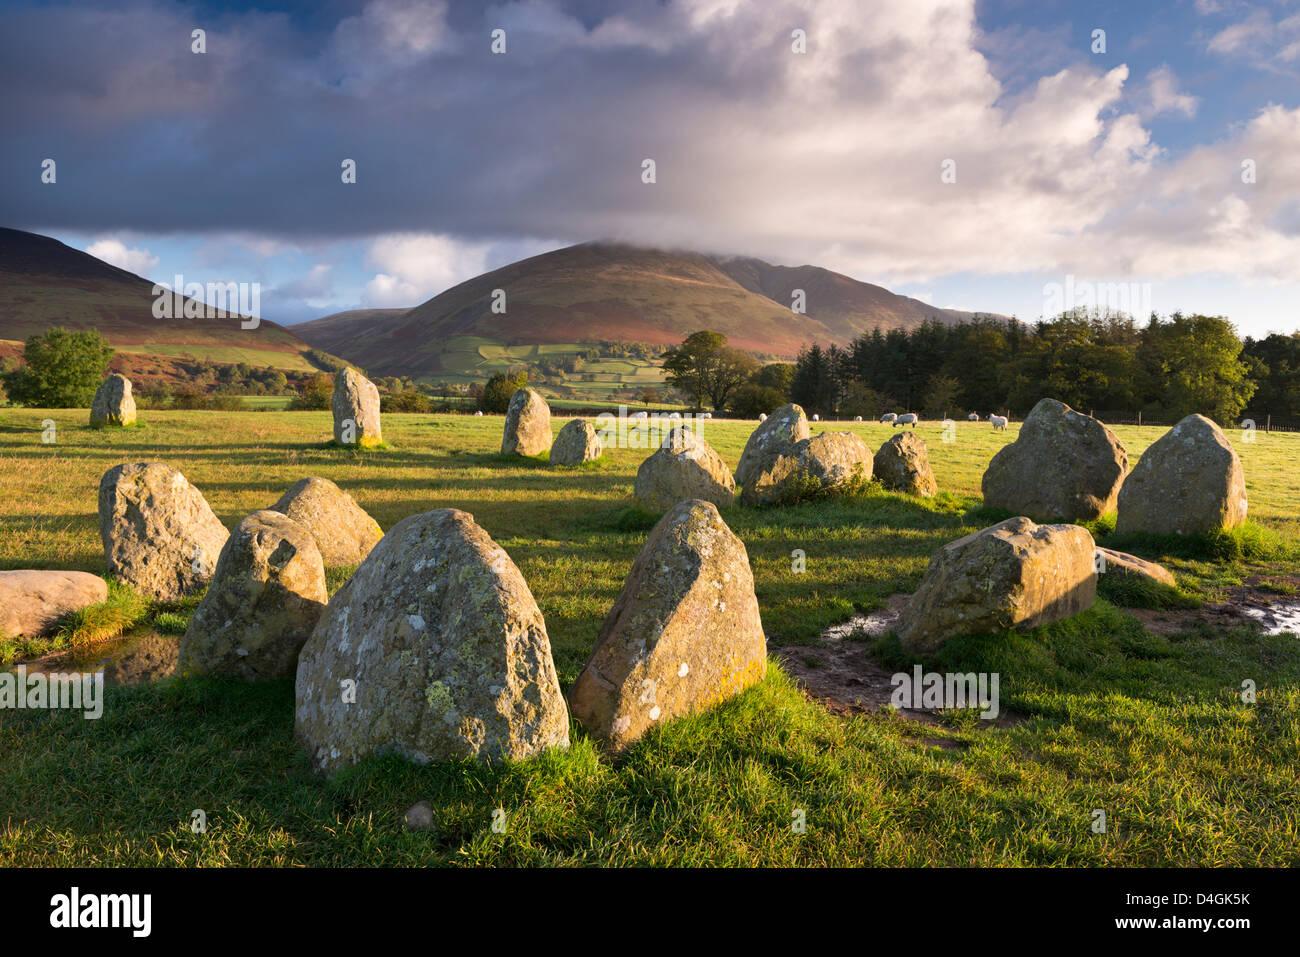 Castlerigg Stone Circle mit Blencathra Berg hinter Seenplatte, Cumbria, England. Herbst (Oktober) 2012. Stockbild